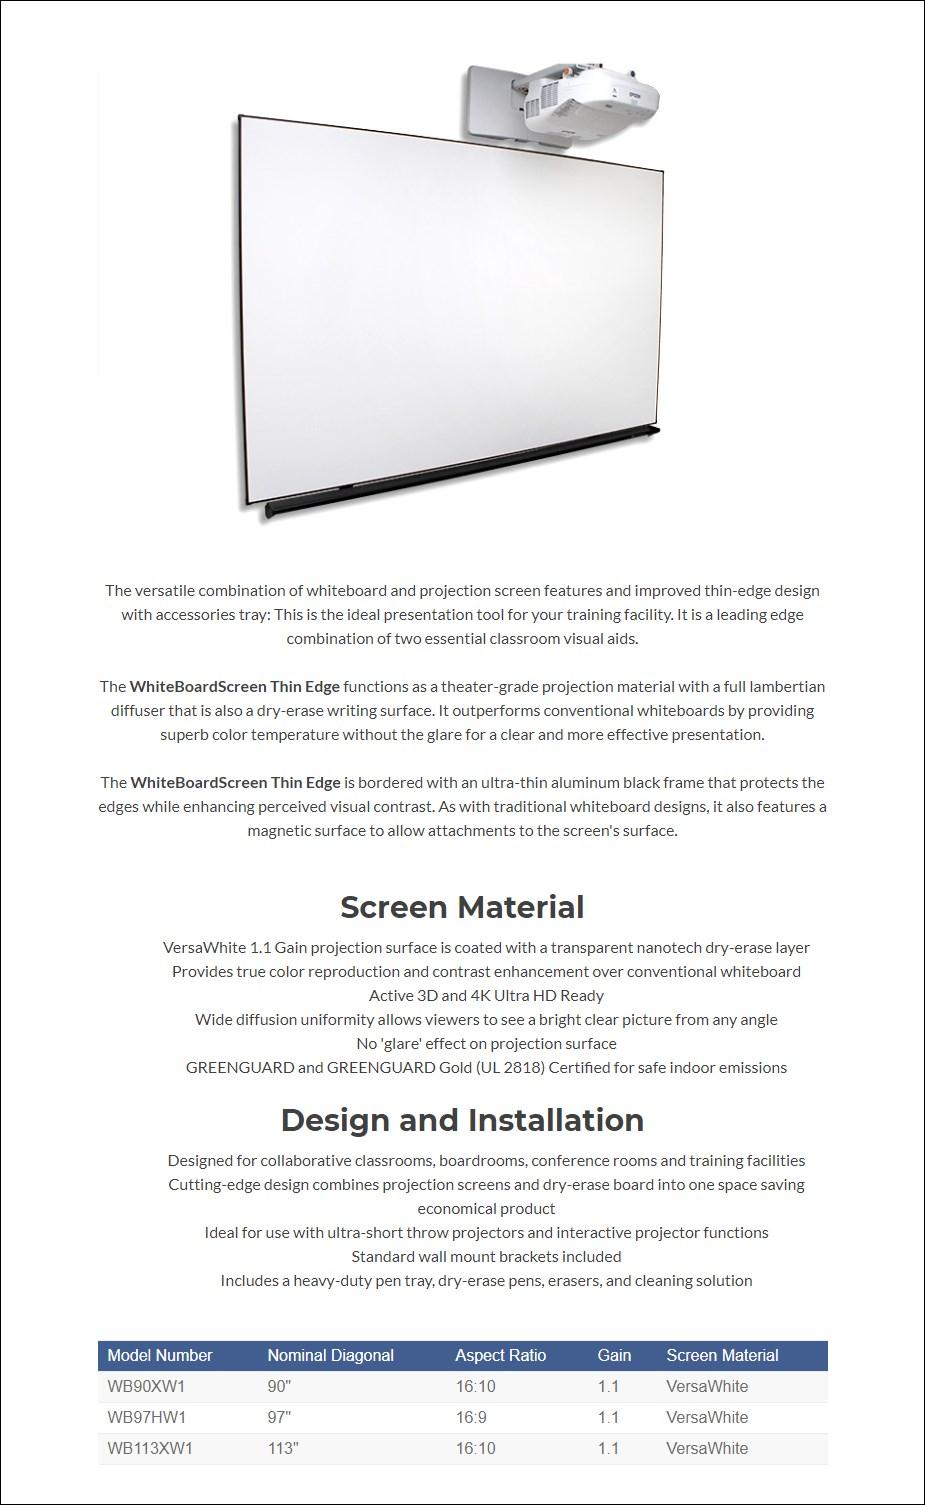 elite-screens-90-1610-whiteboard-thinedge-projection-screen-ac30998-1.jpg